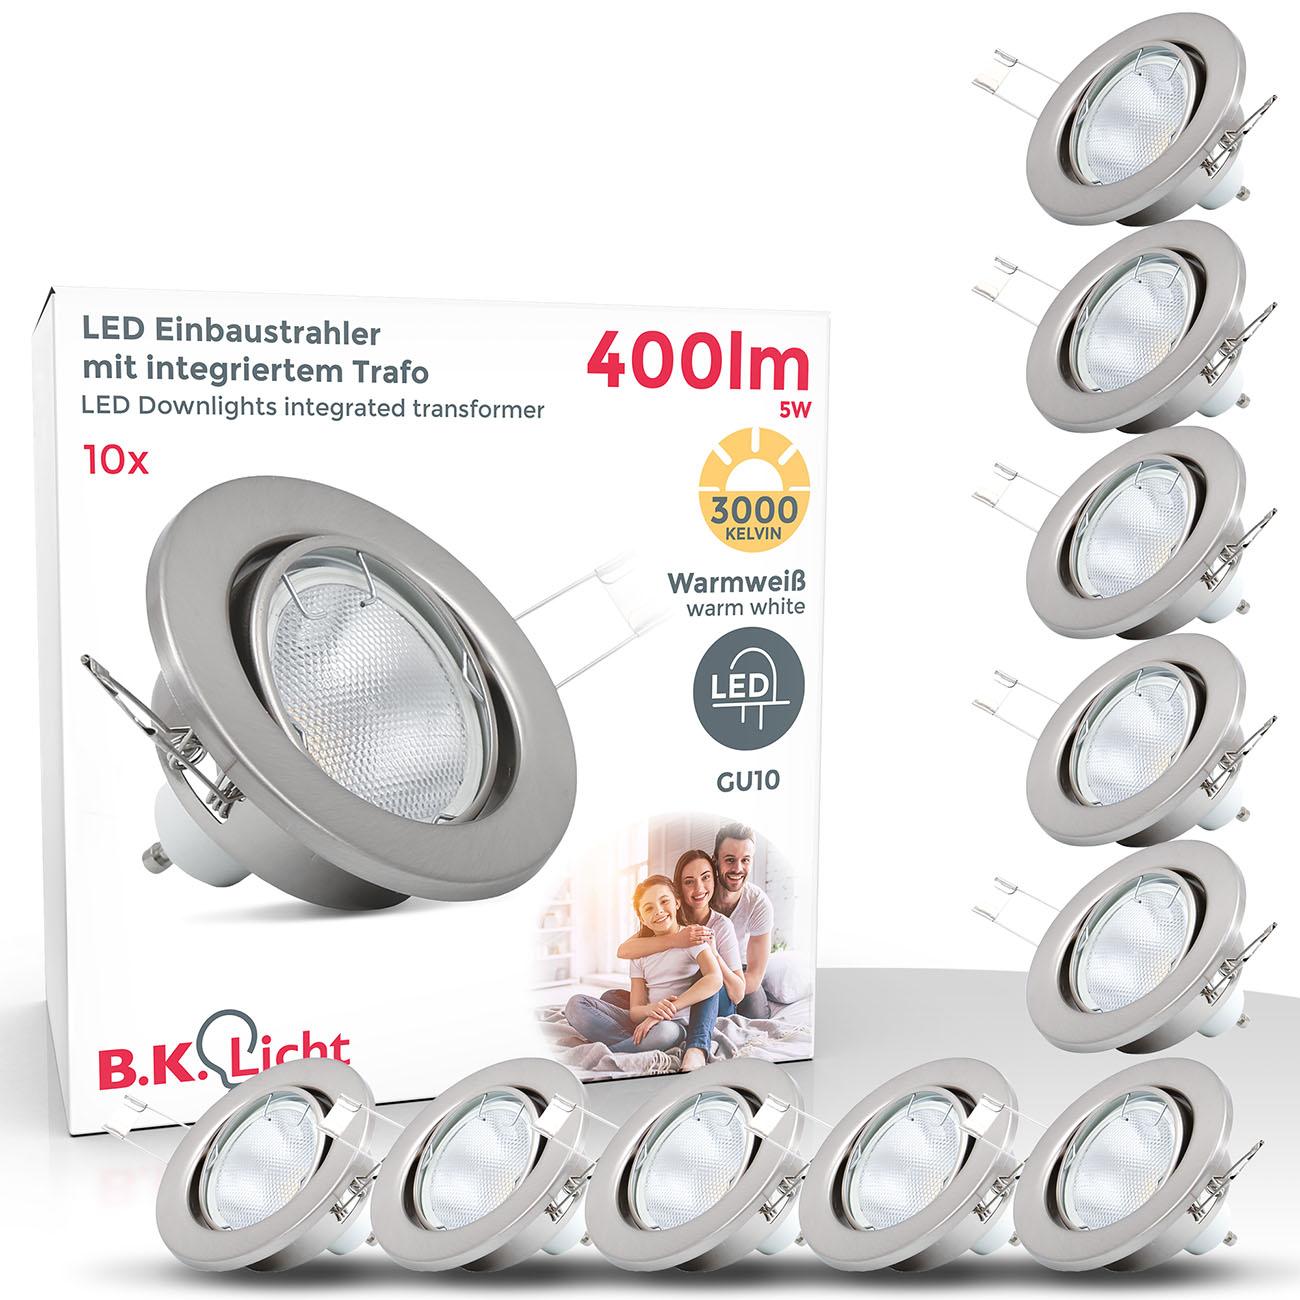 LED Einbaustrahler | Einbauleuchte 10er SET | ultra flach 5W inkl. GU10